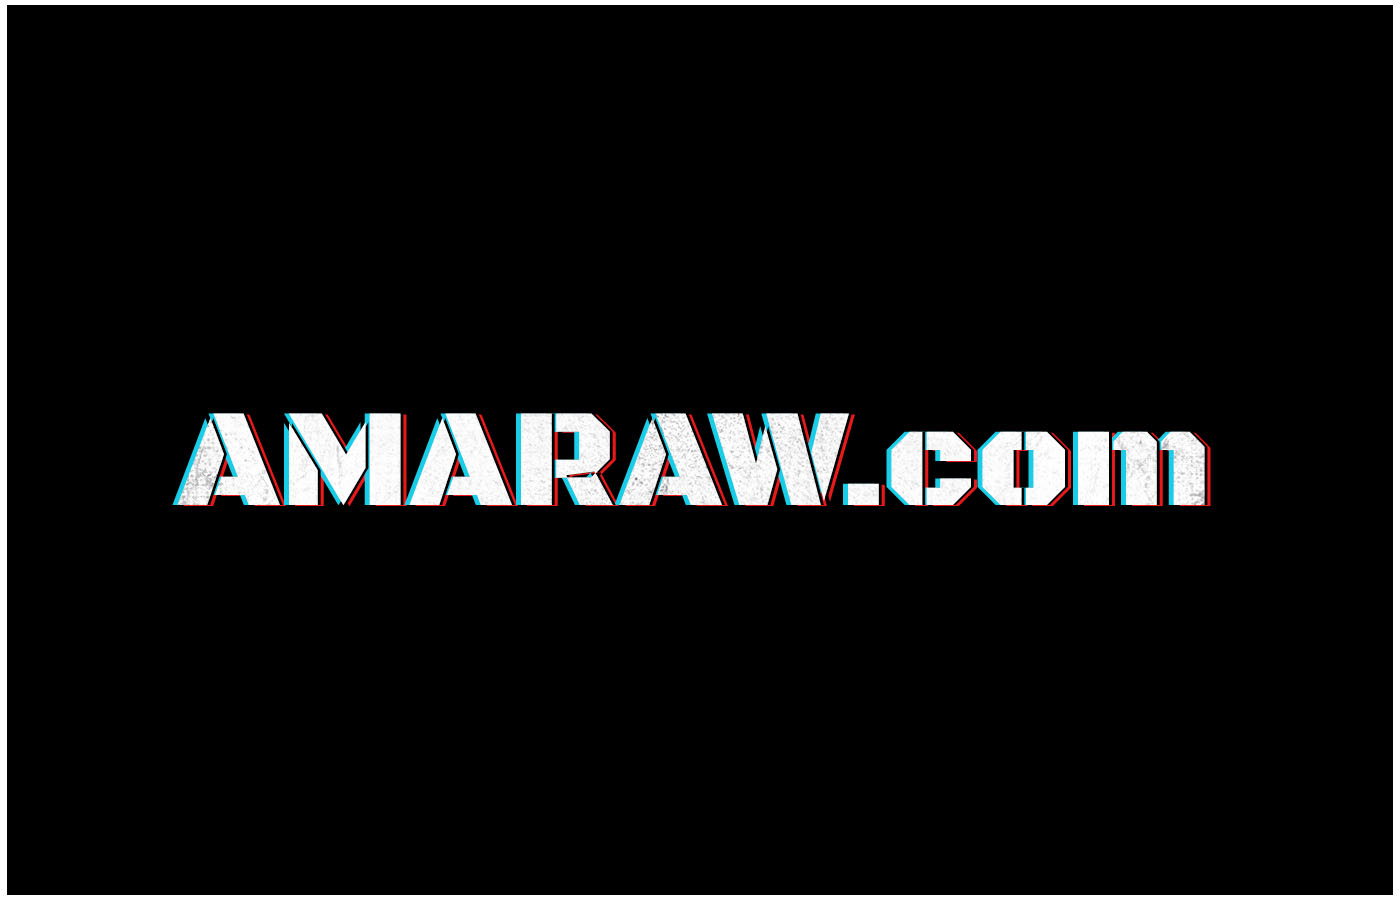 amaraw